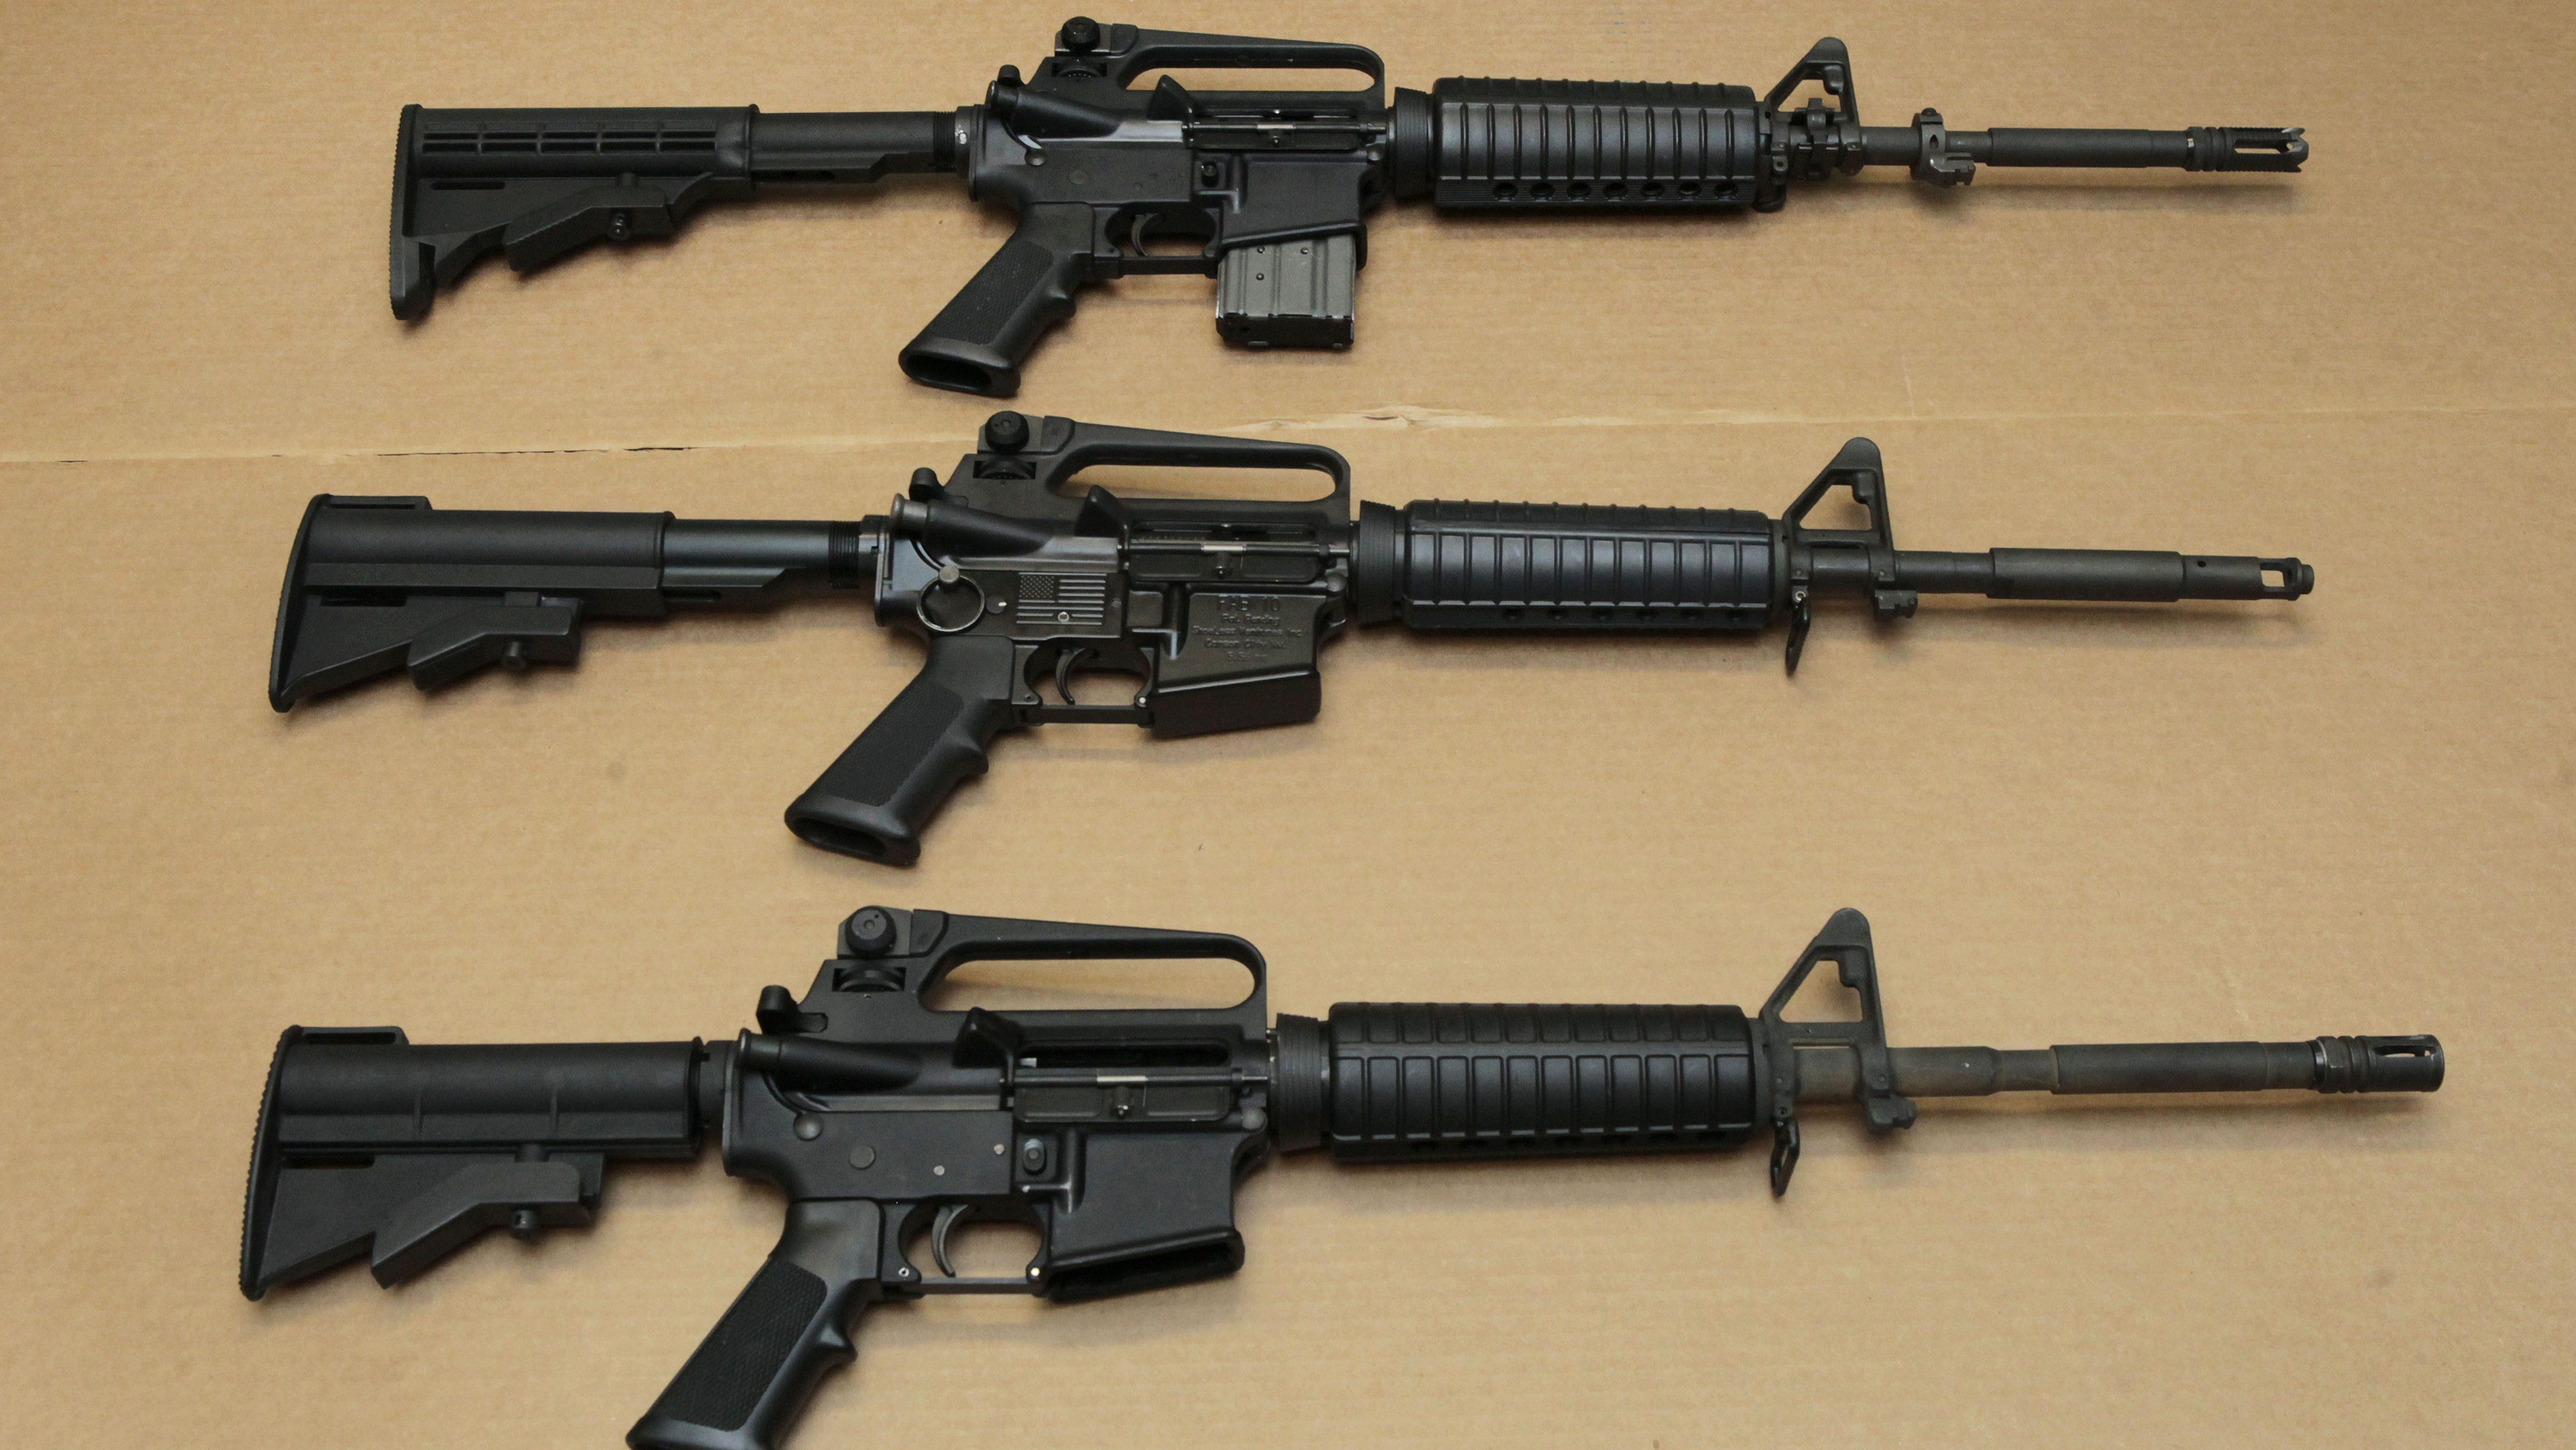 Three variations of the AR-15 assault rifle